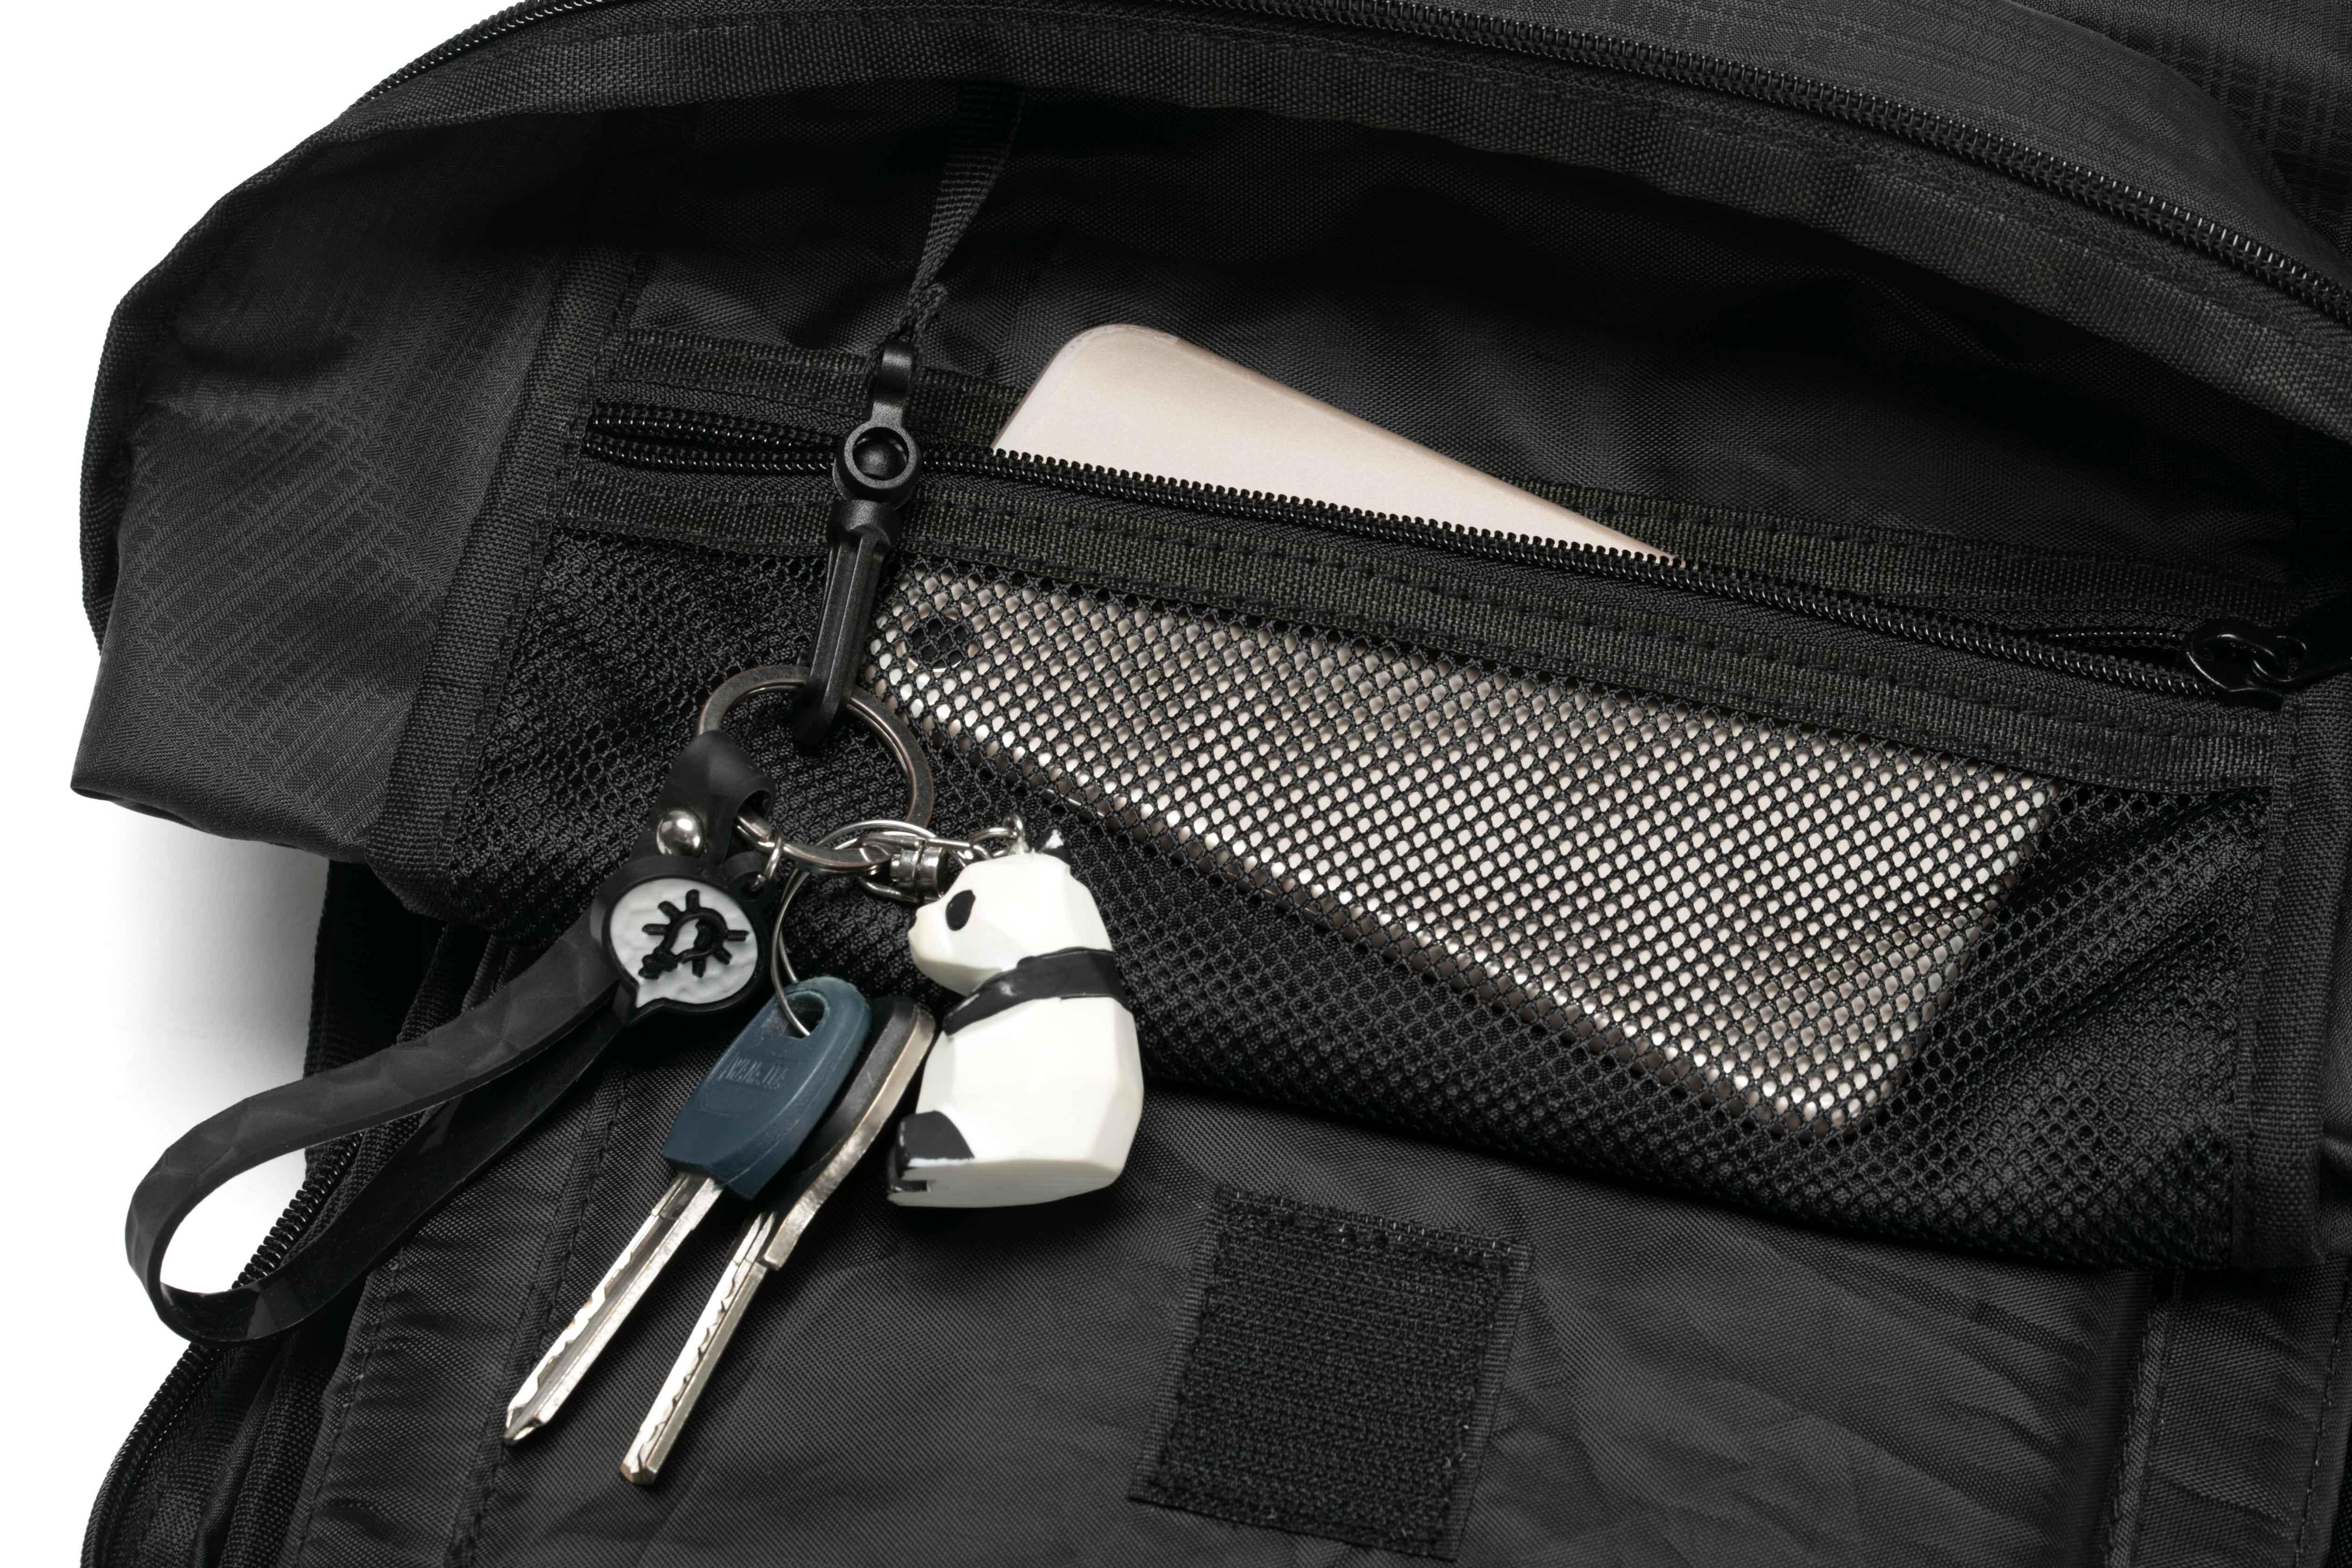 CTY-01 Key buckle